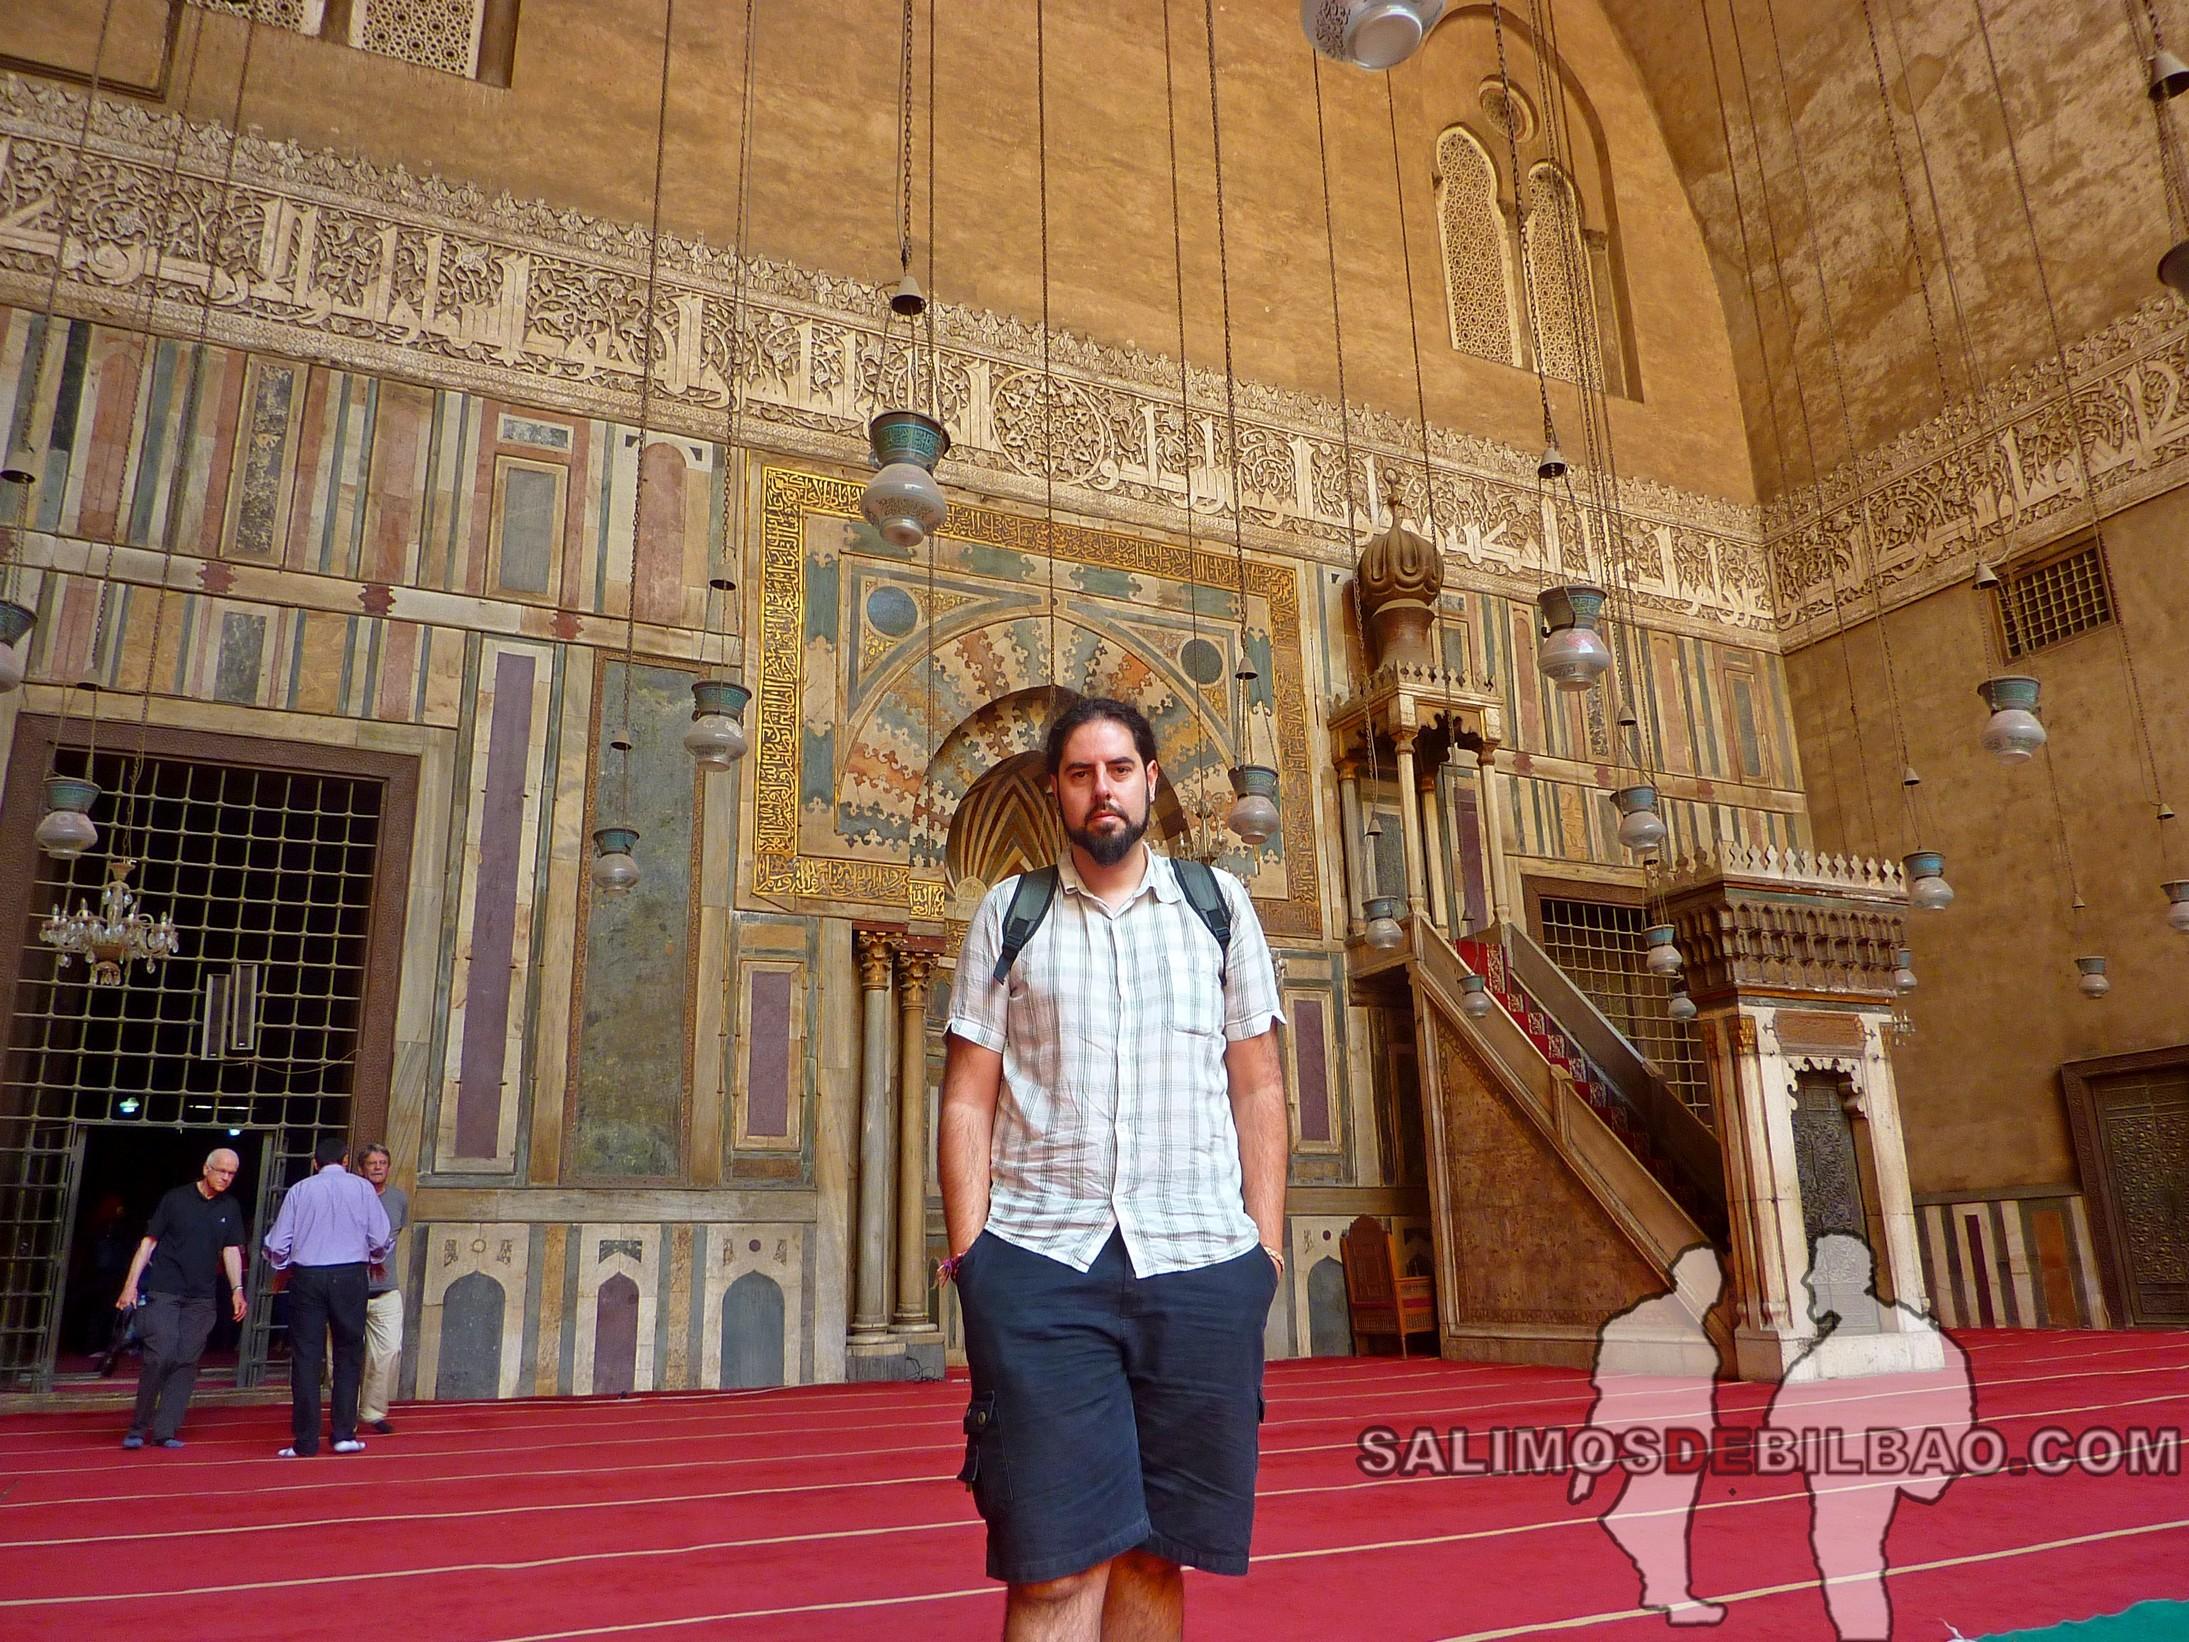 0033. Katz, Mezquita y Madraza de Sultan Hasan, Cairo